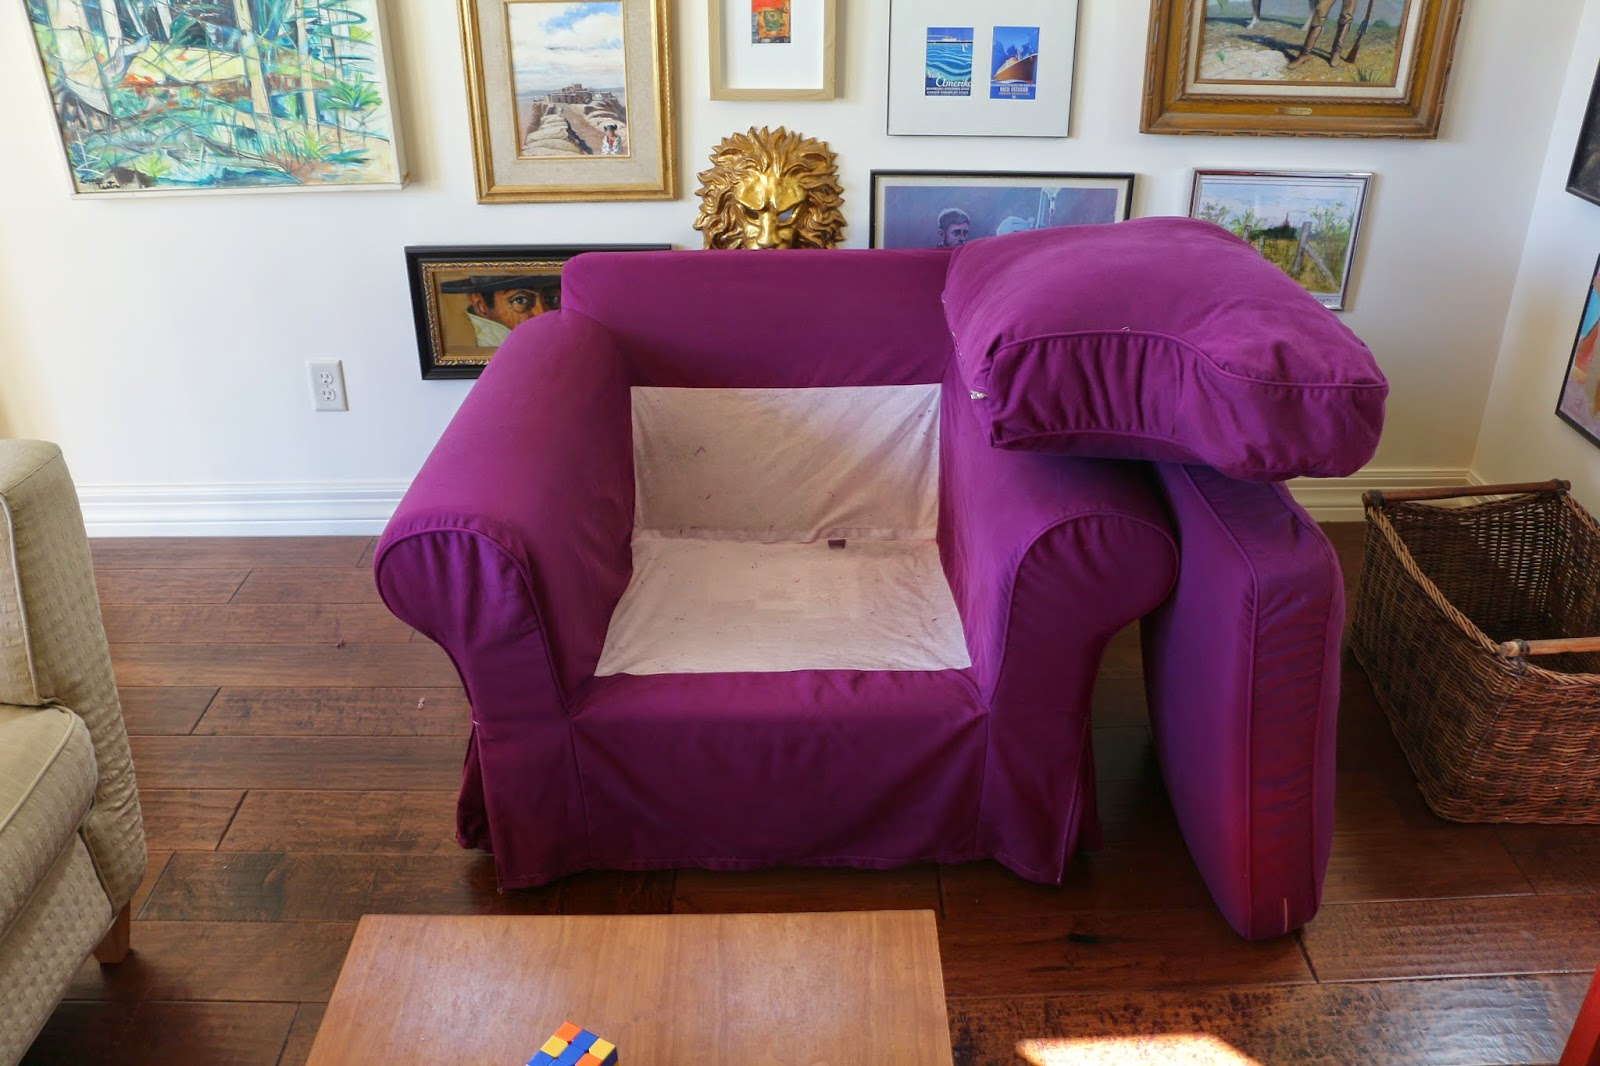 Peachy Dusty Coyote Dyeing An Ektorp Slipcover Creativecarmelina Interior Chair Design Creativecarmelinacom